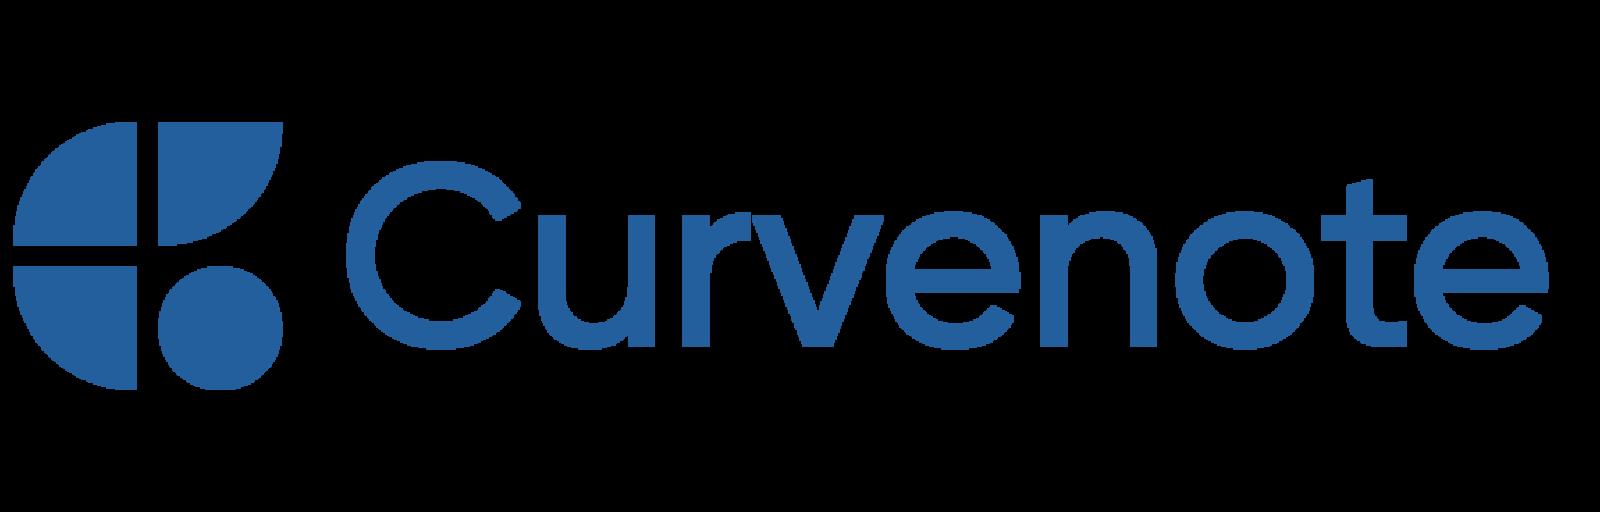 curvenote.dev